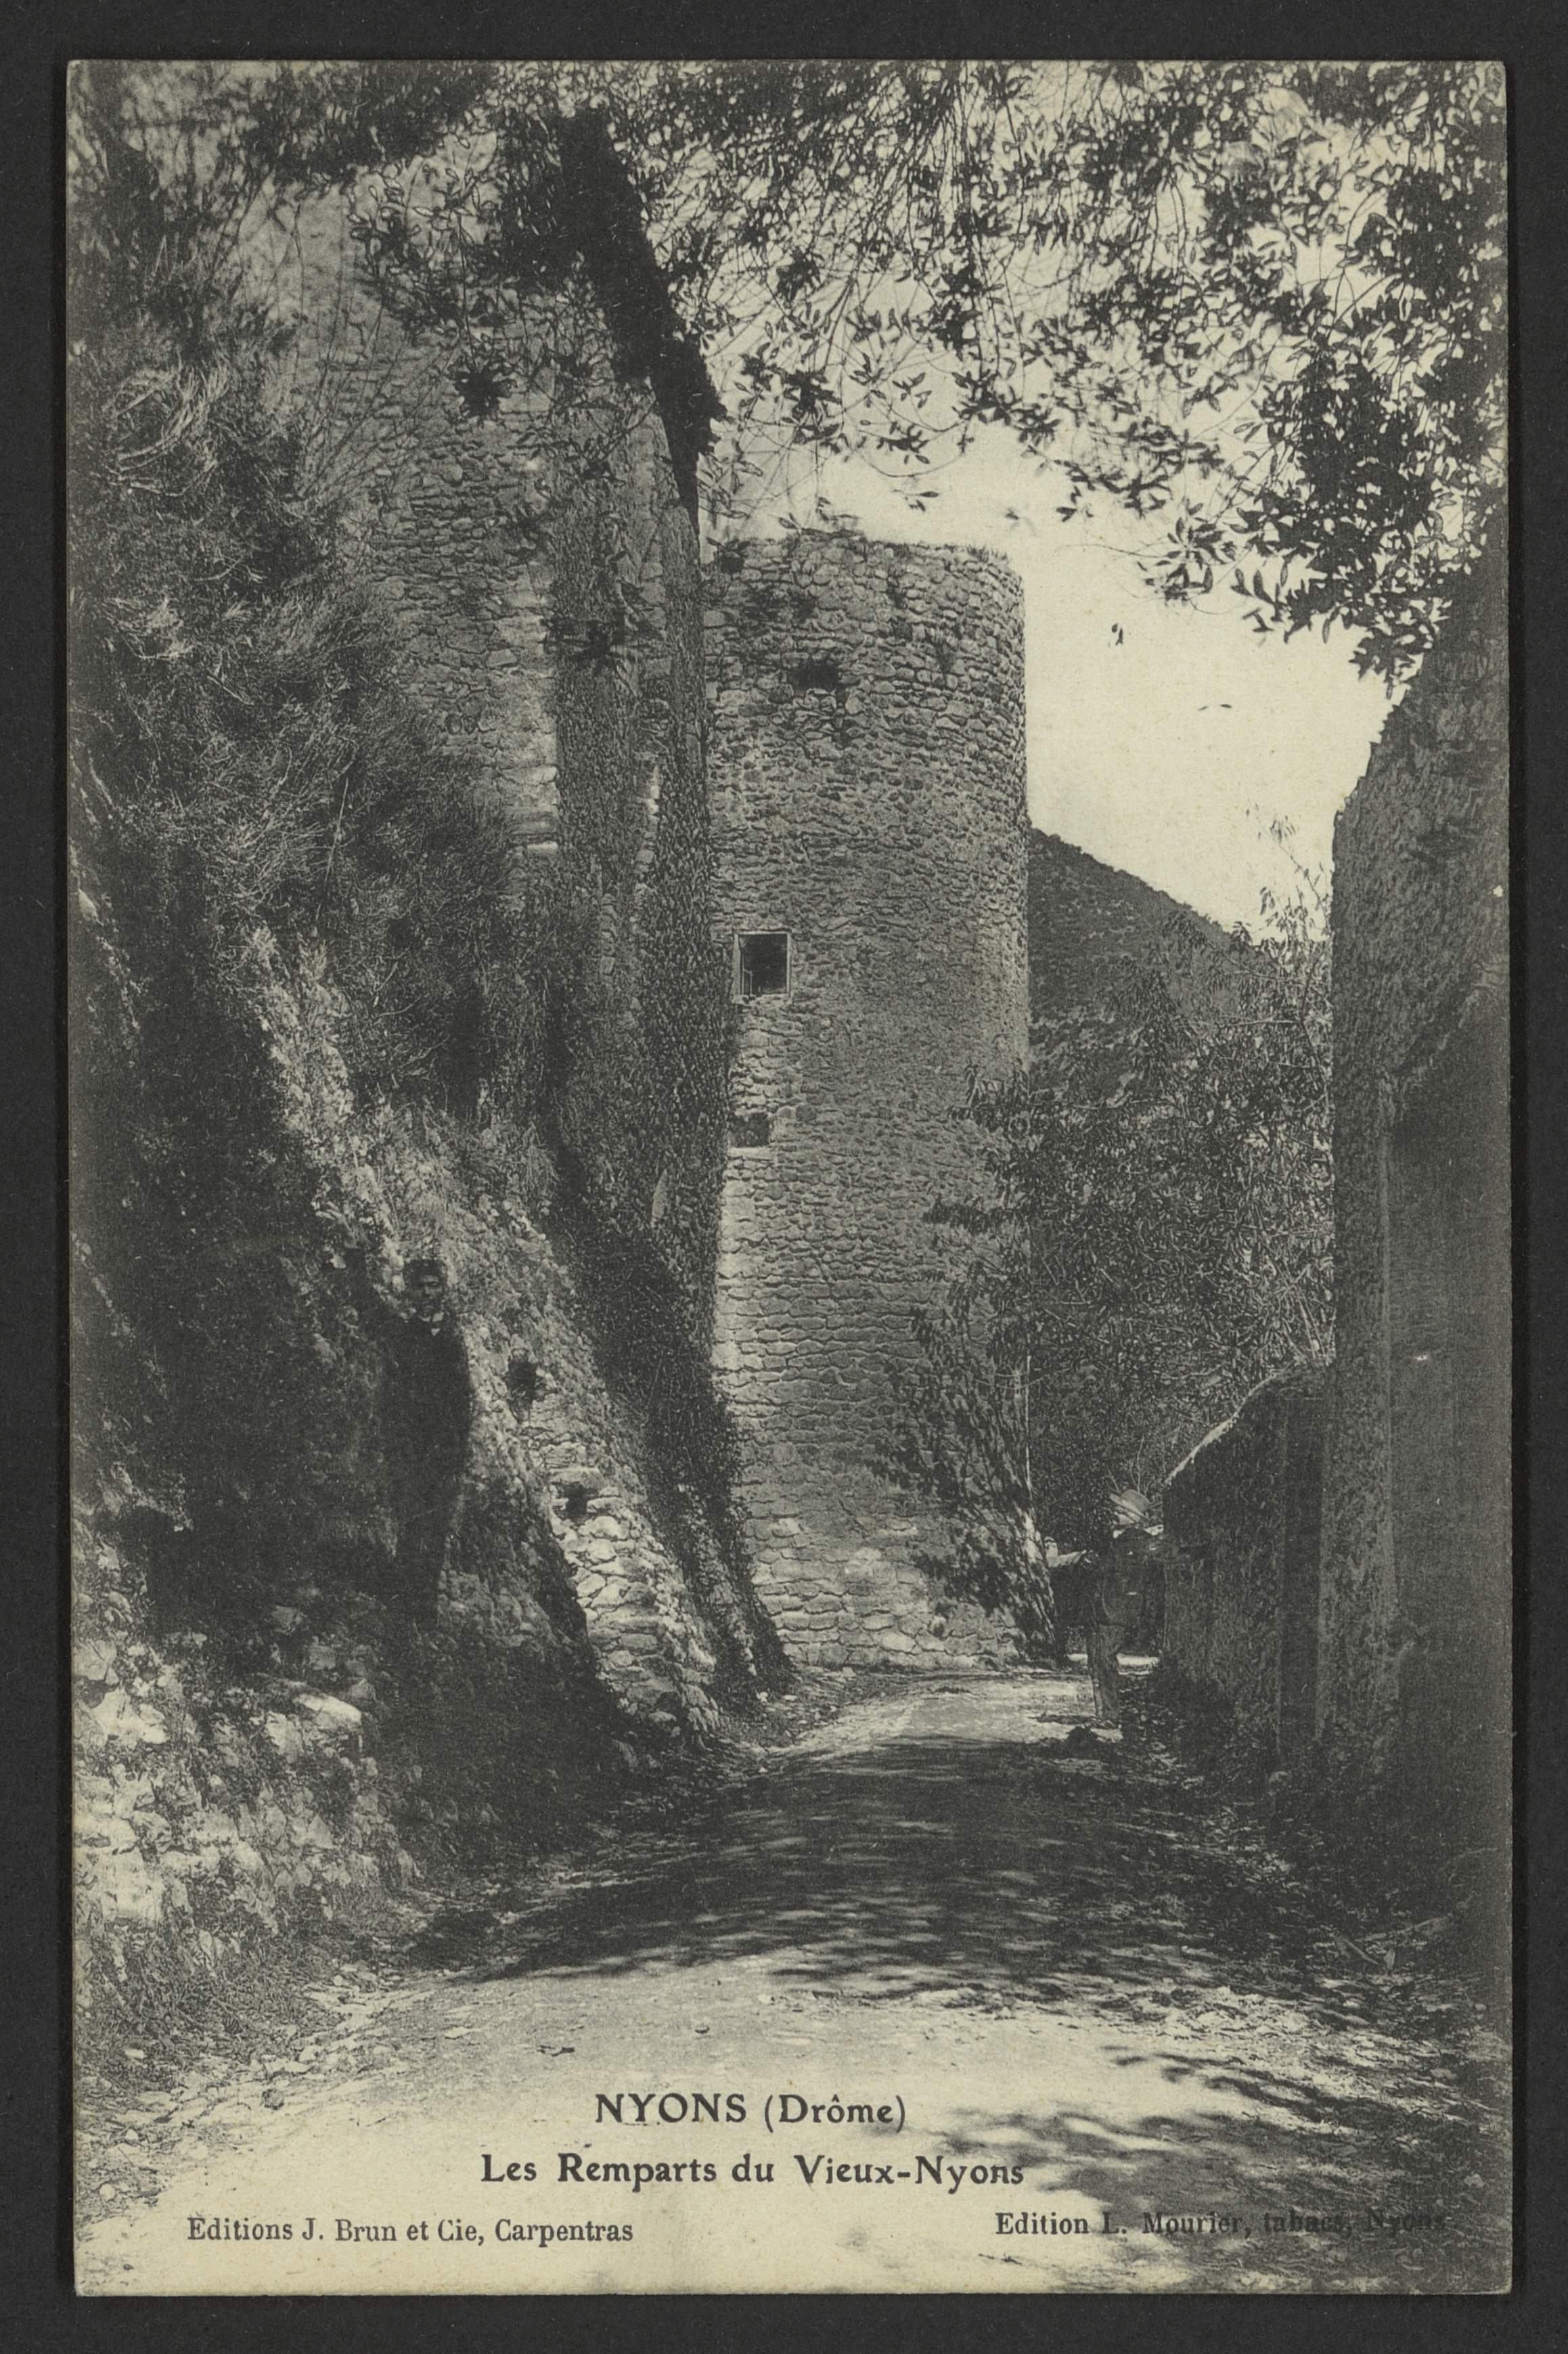 Nyons (Drôme) - Les remparts du vieux-Nyons